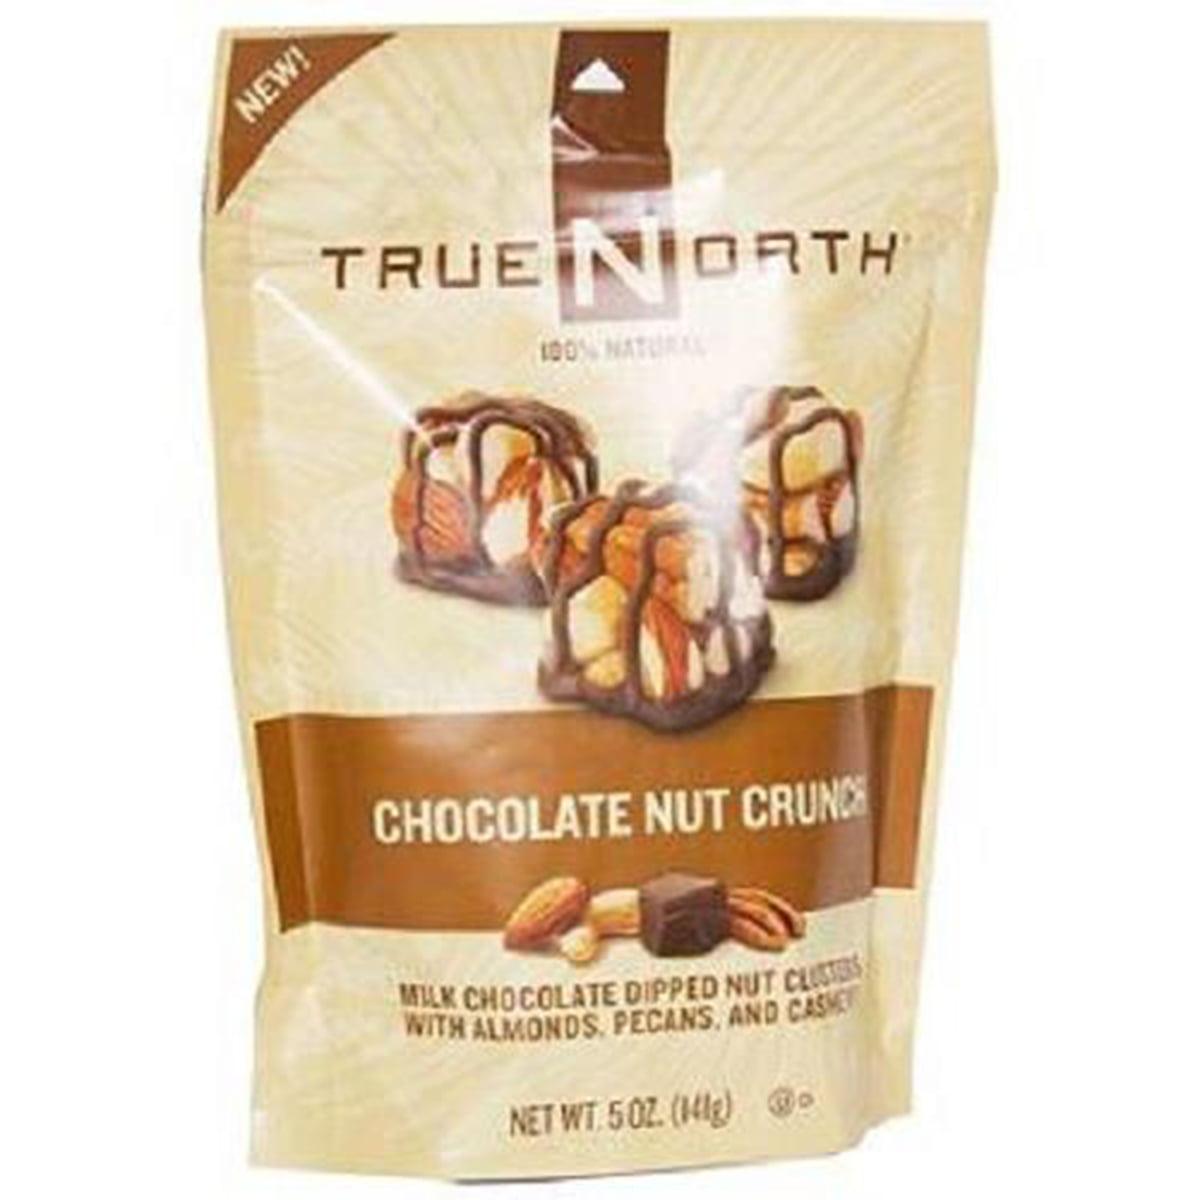 TRUENORTH Chocolate Nut Crunch Nut Clusters, 5 oz by